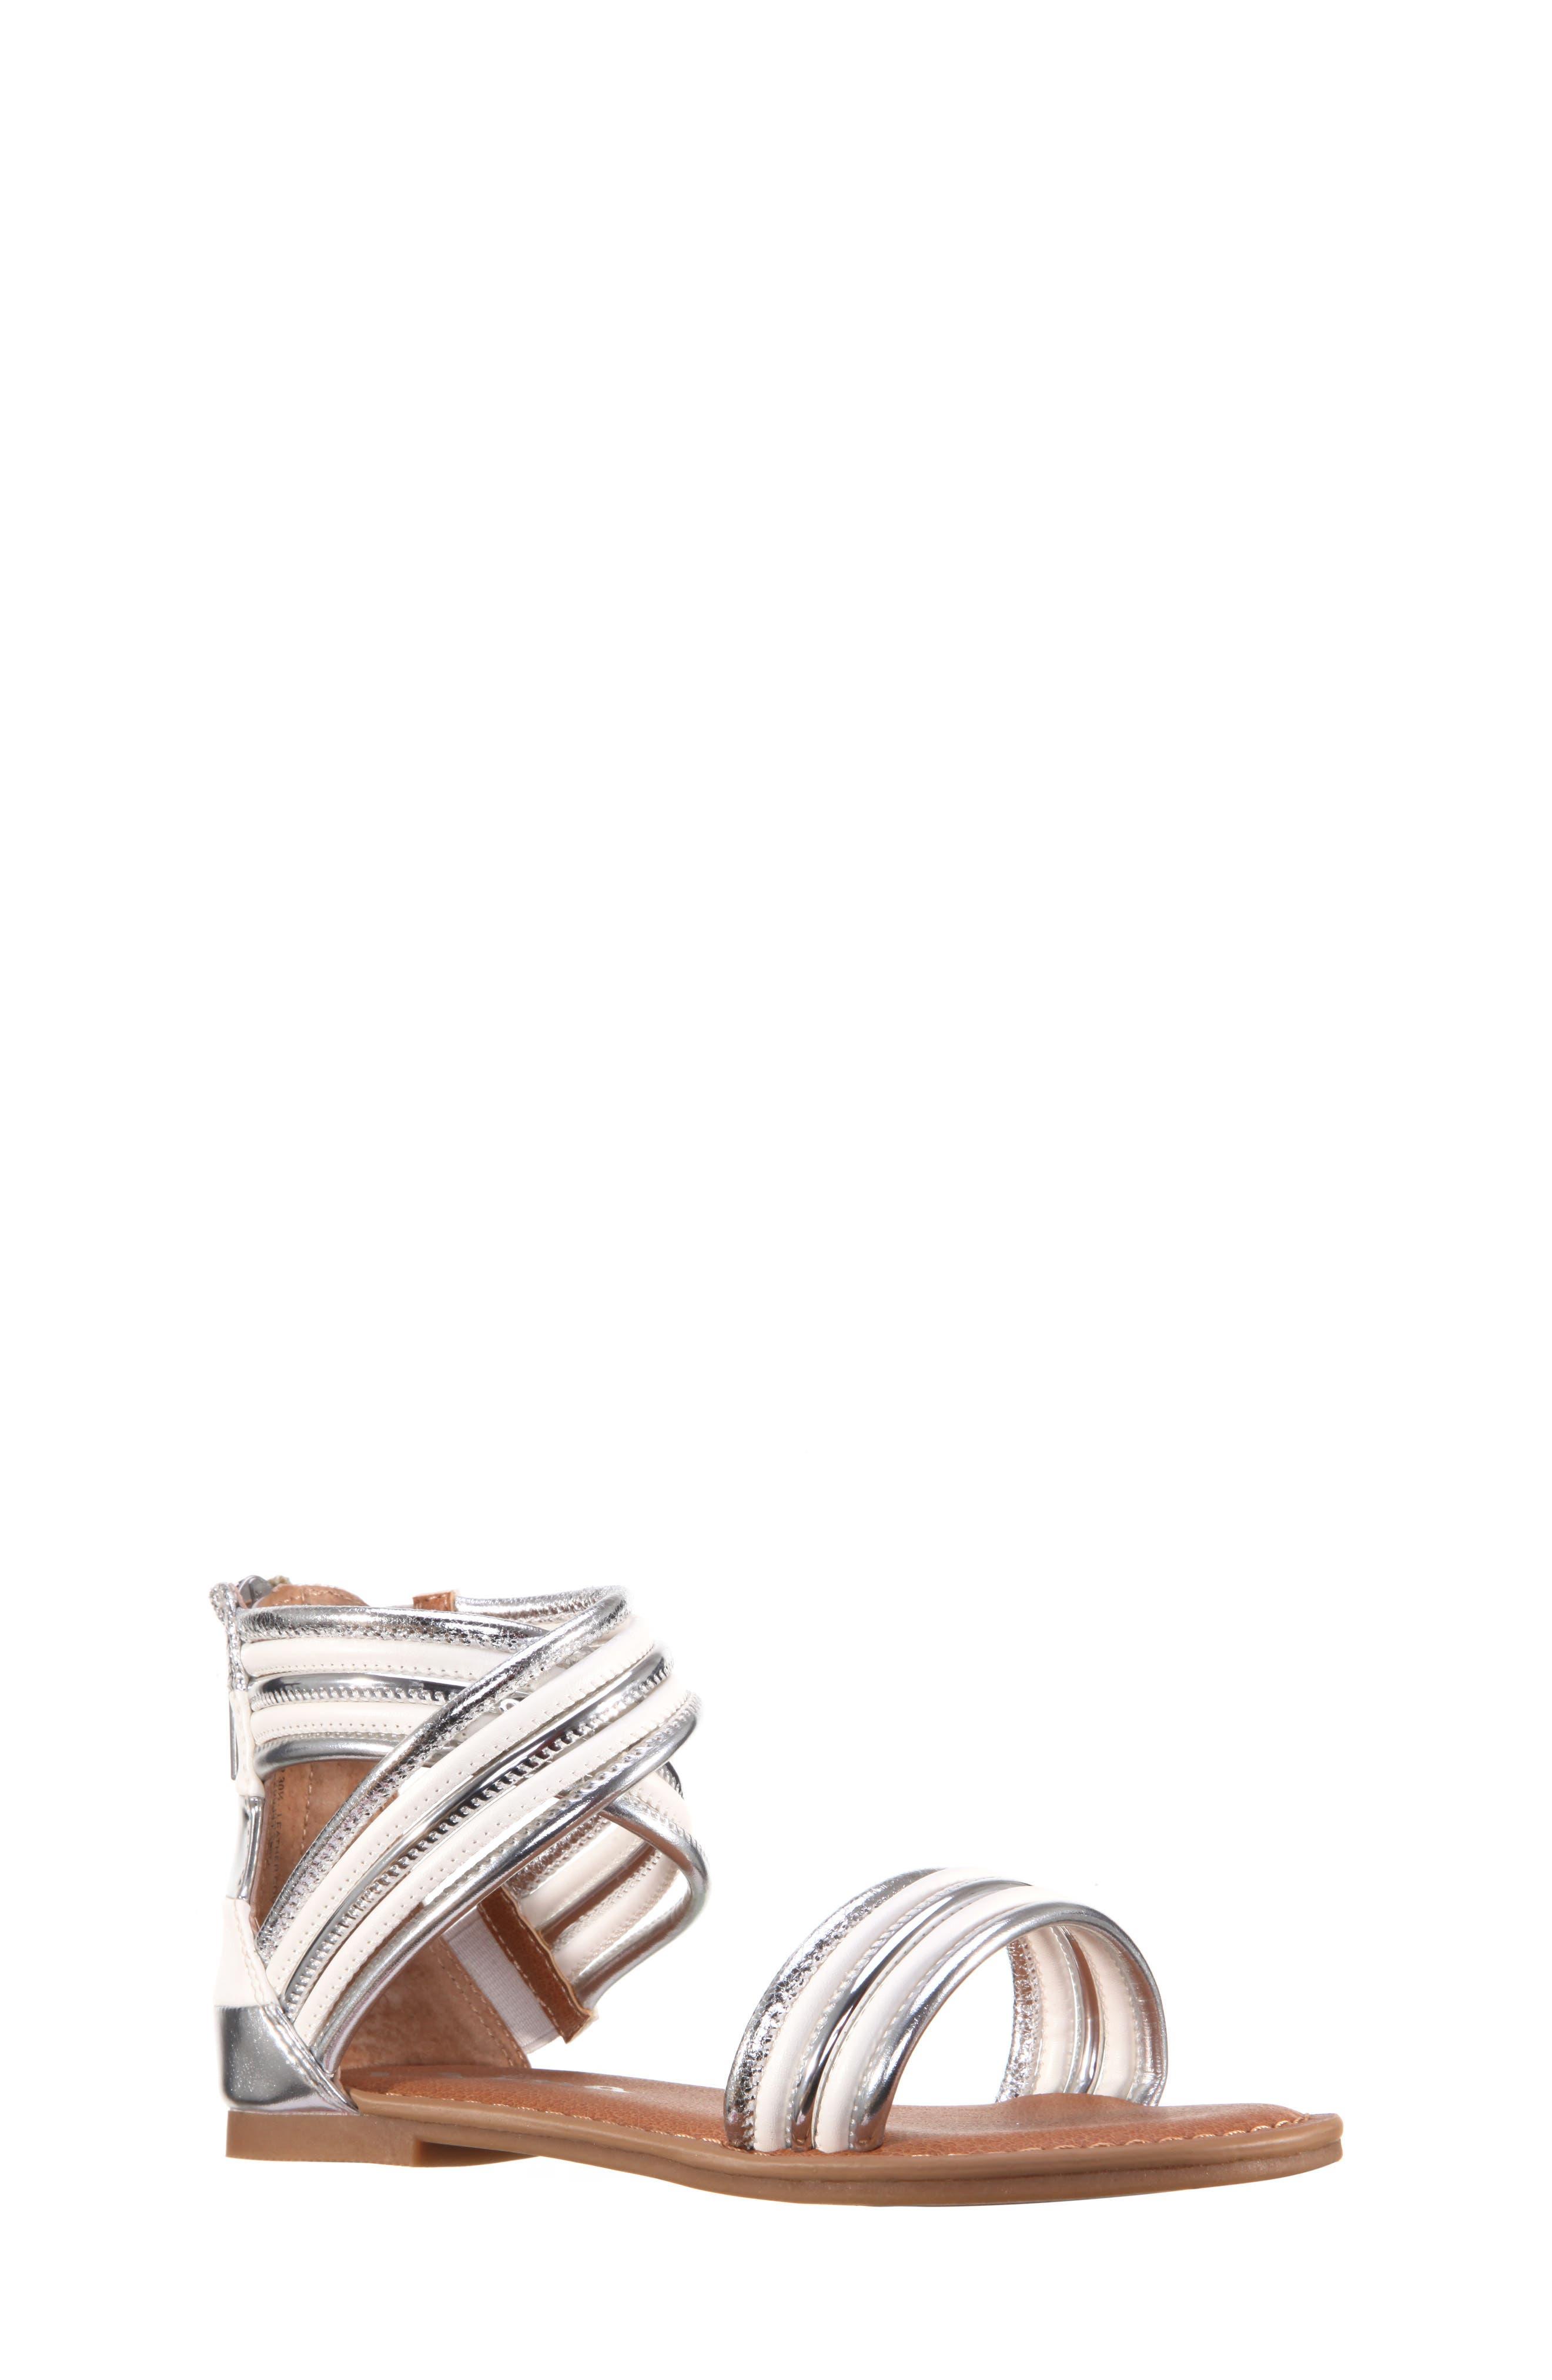 Roxsanne Multistrap Sandal,                             Main thumbnail 1, color,                             045